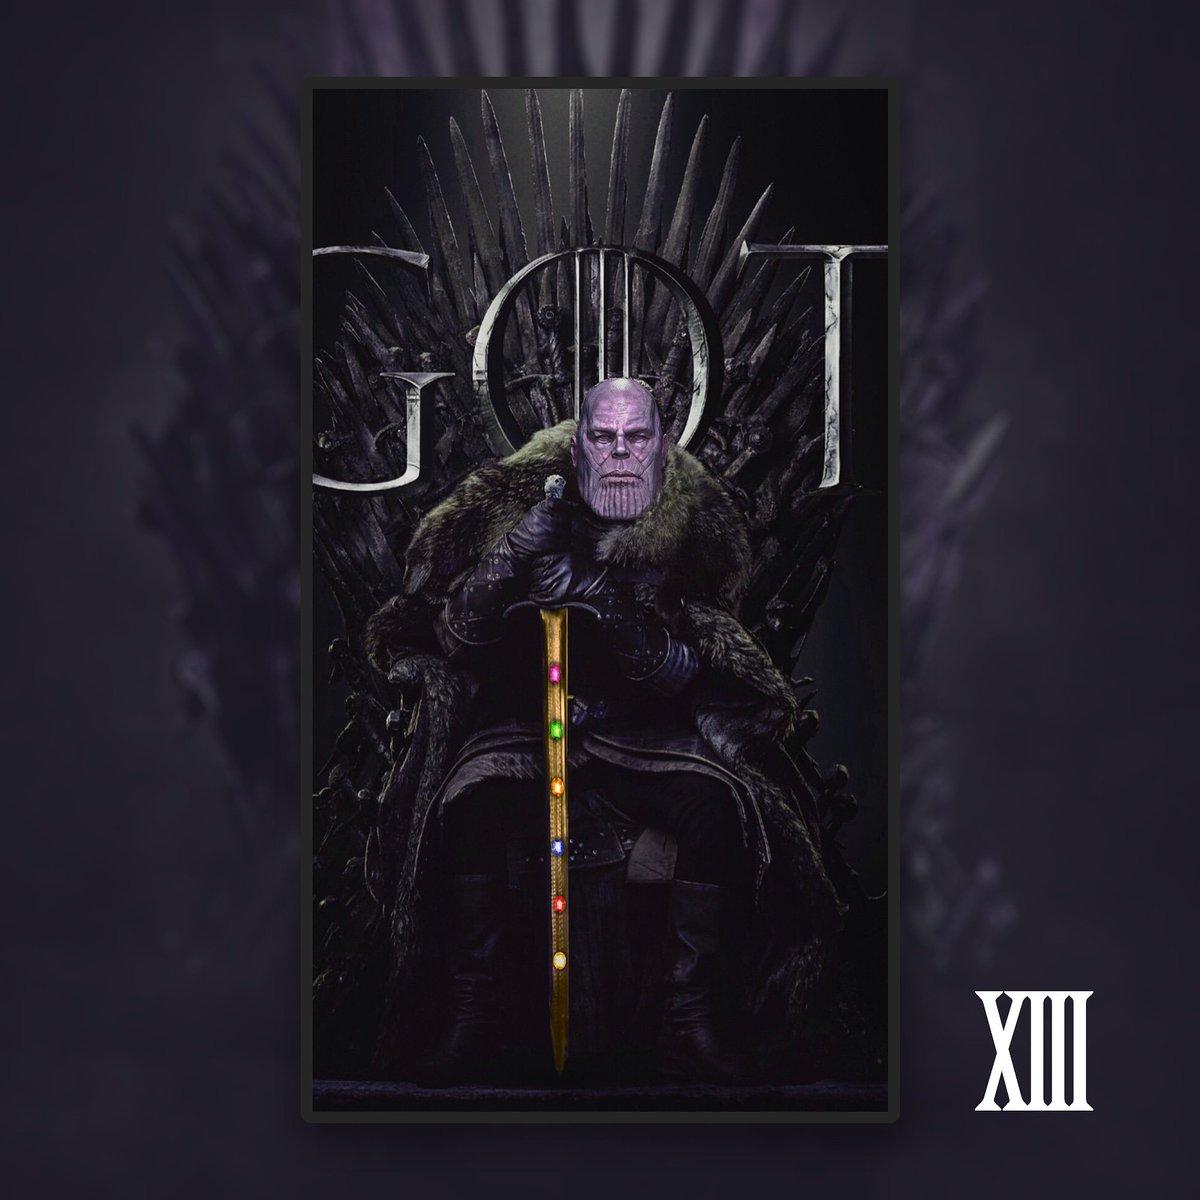 RT @walidchachoua: Game of Thanos - The Infinity Sword ⚔️ #GameofThrones #Avengers #GameOfThronesFinale #Thanos https://t.co/kN65QzNu05